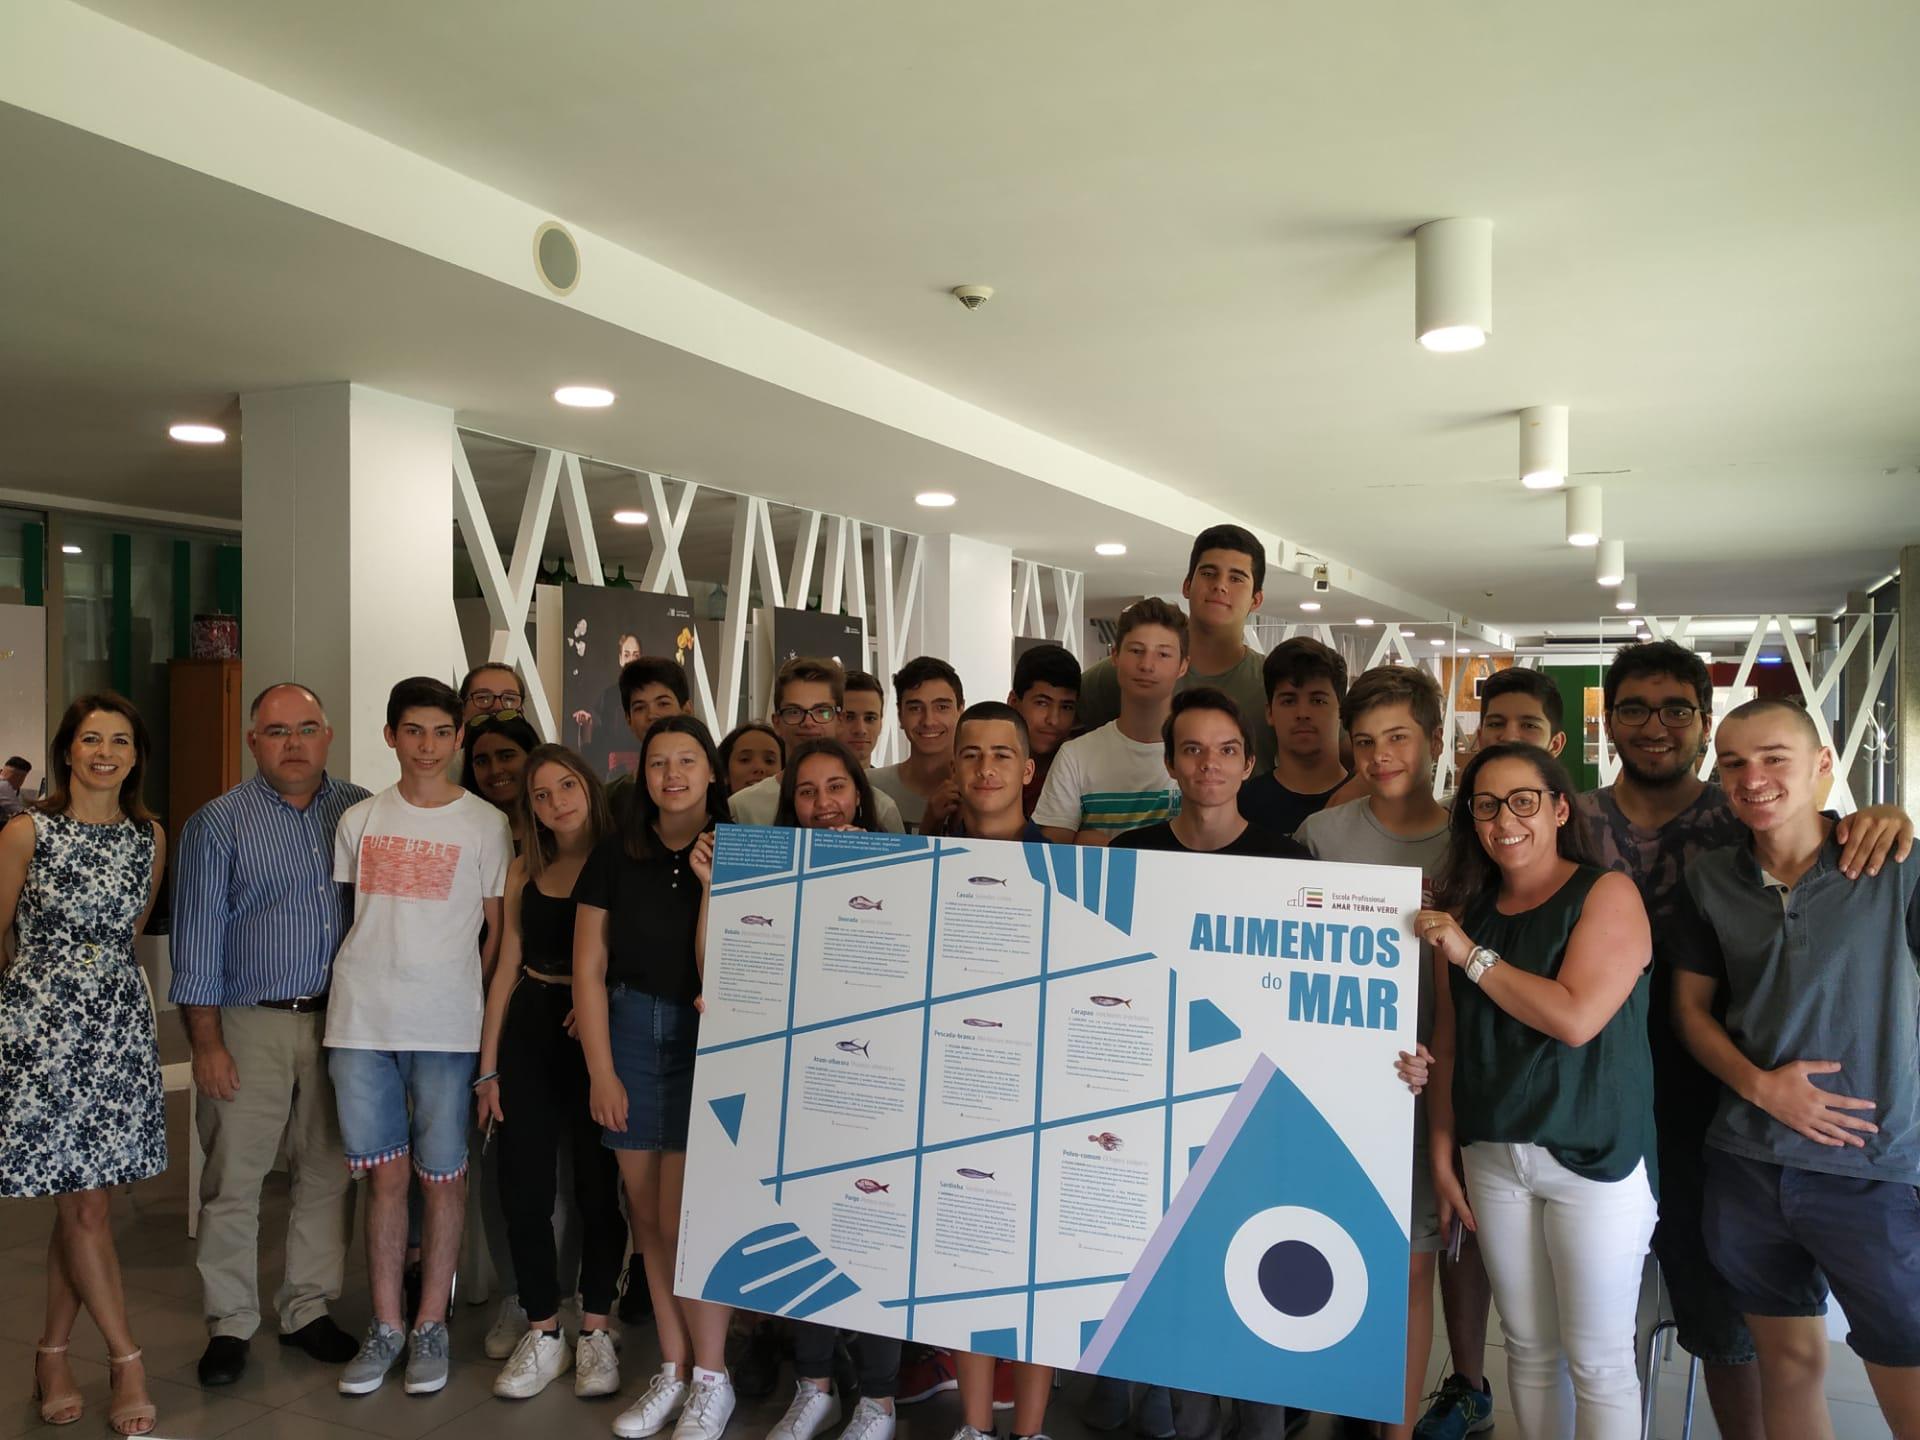 EPATV vence 3º lugar no desafio Painel dos Alimentos